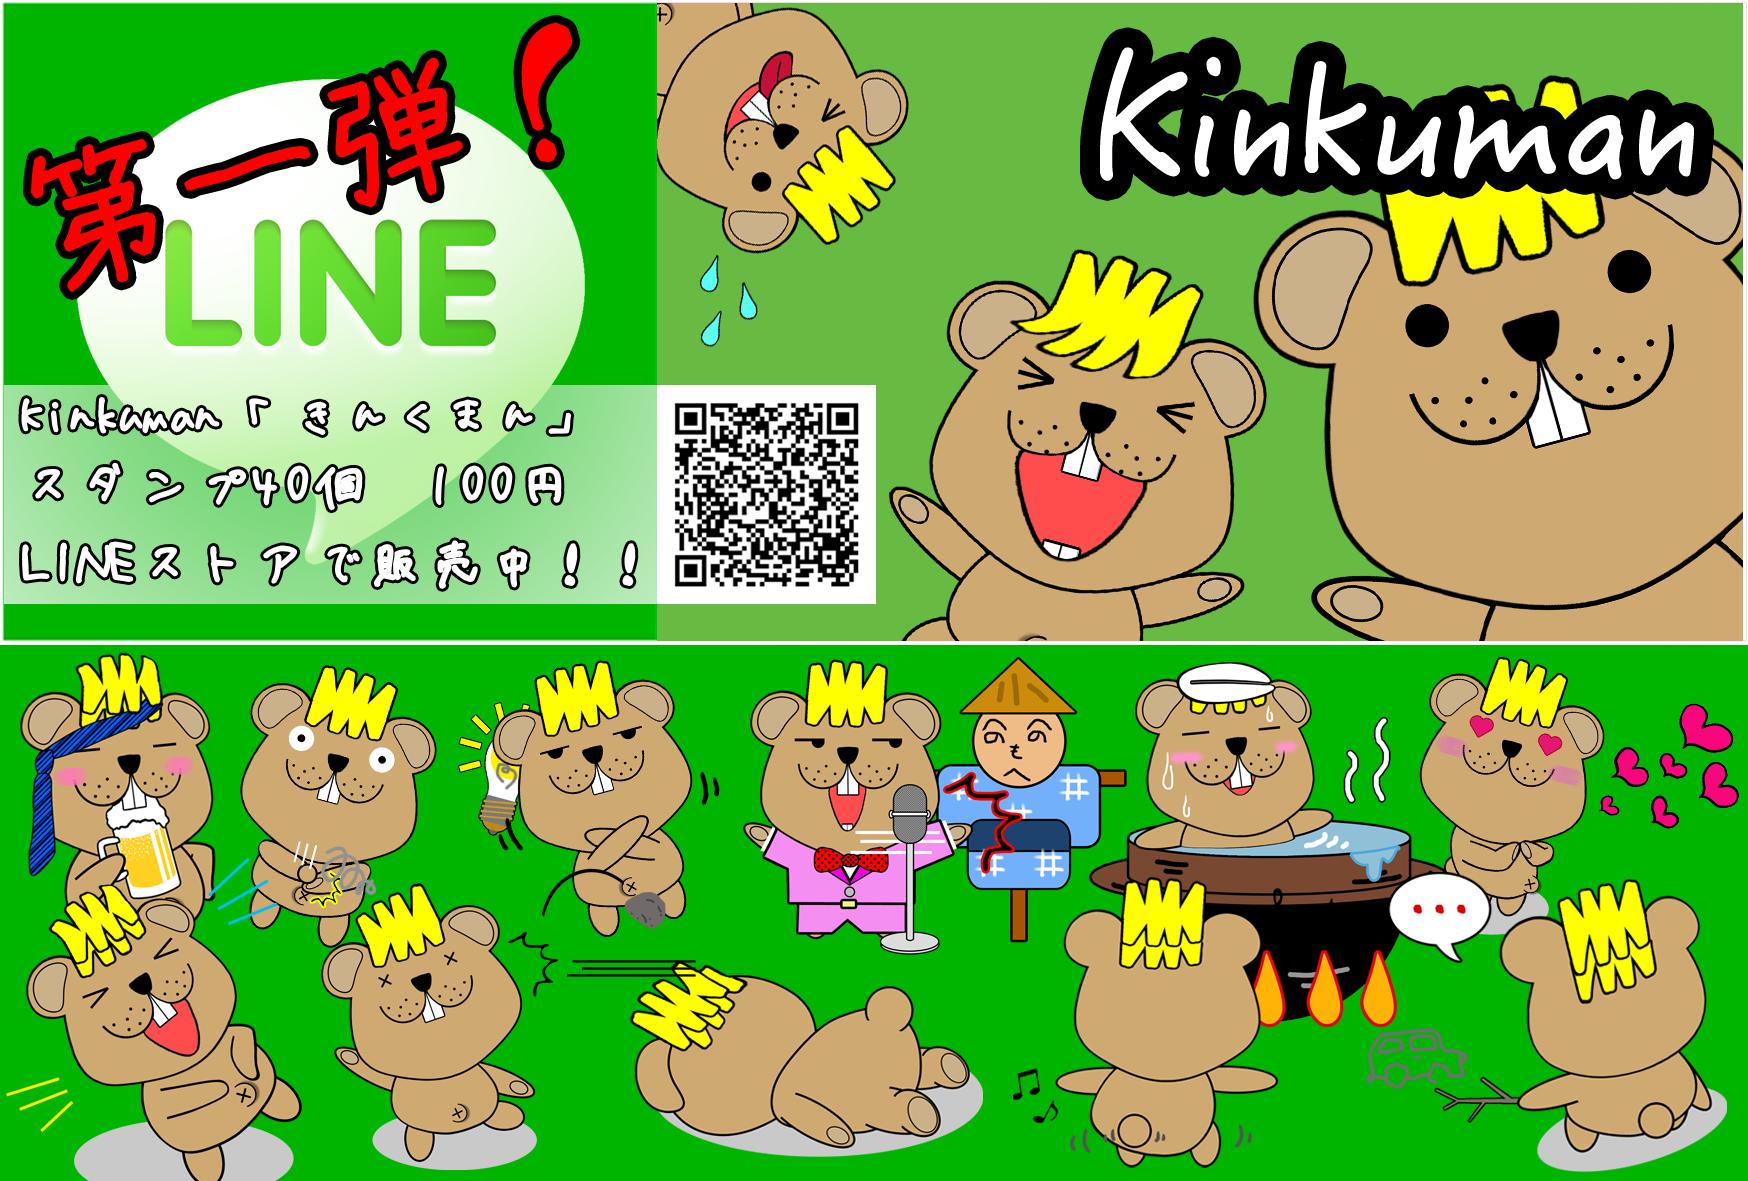 [LINE] LINEスタンプ「Kinkuman」販売開始!